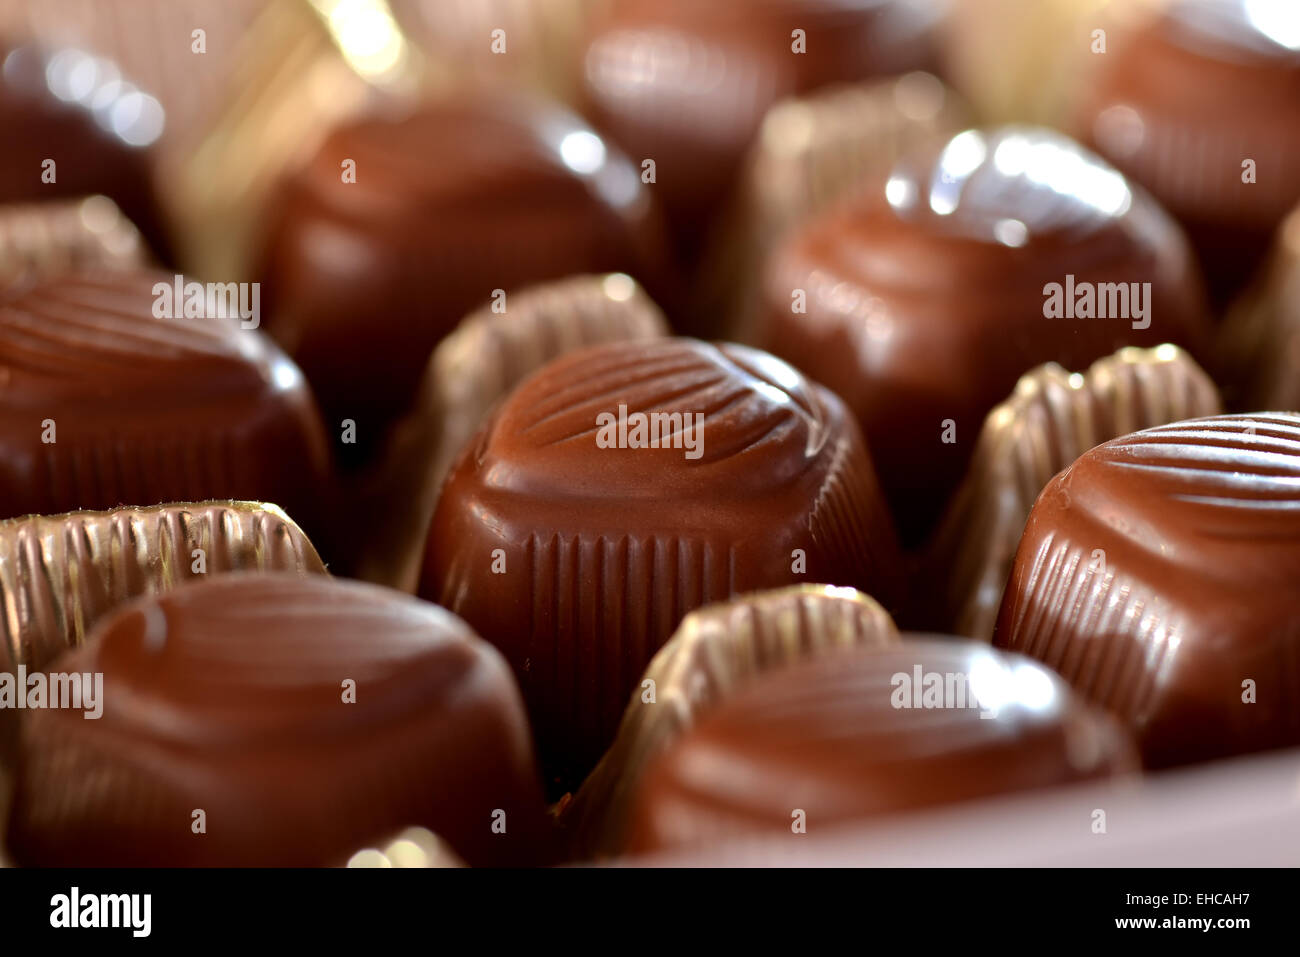 Boxed Chocolates Stock Photo Alamy